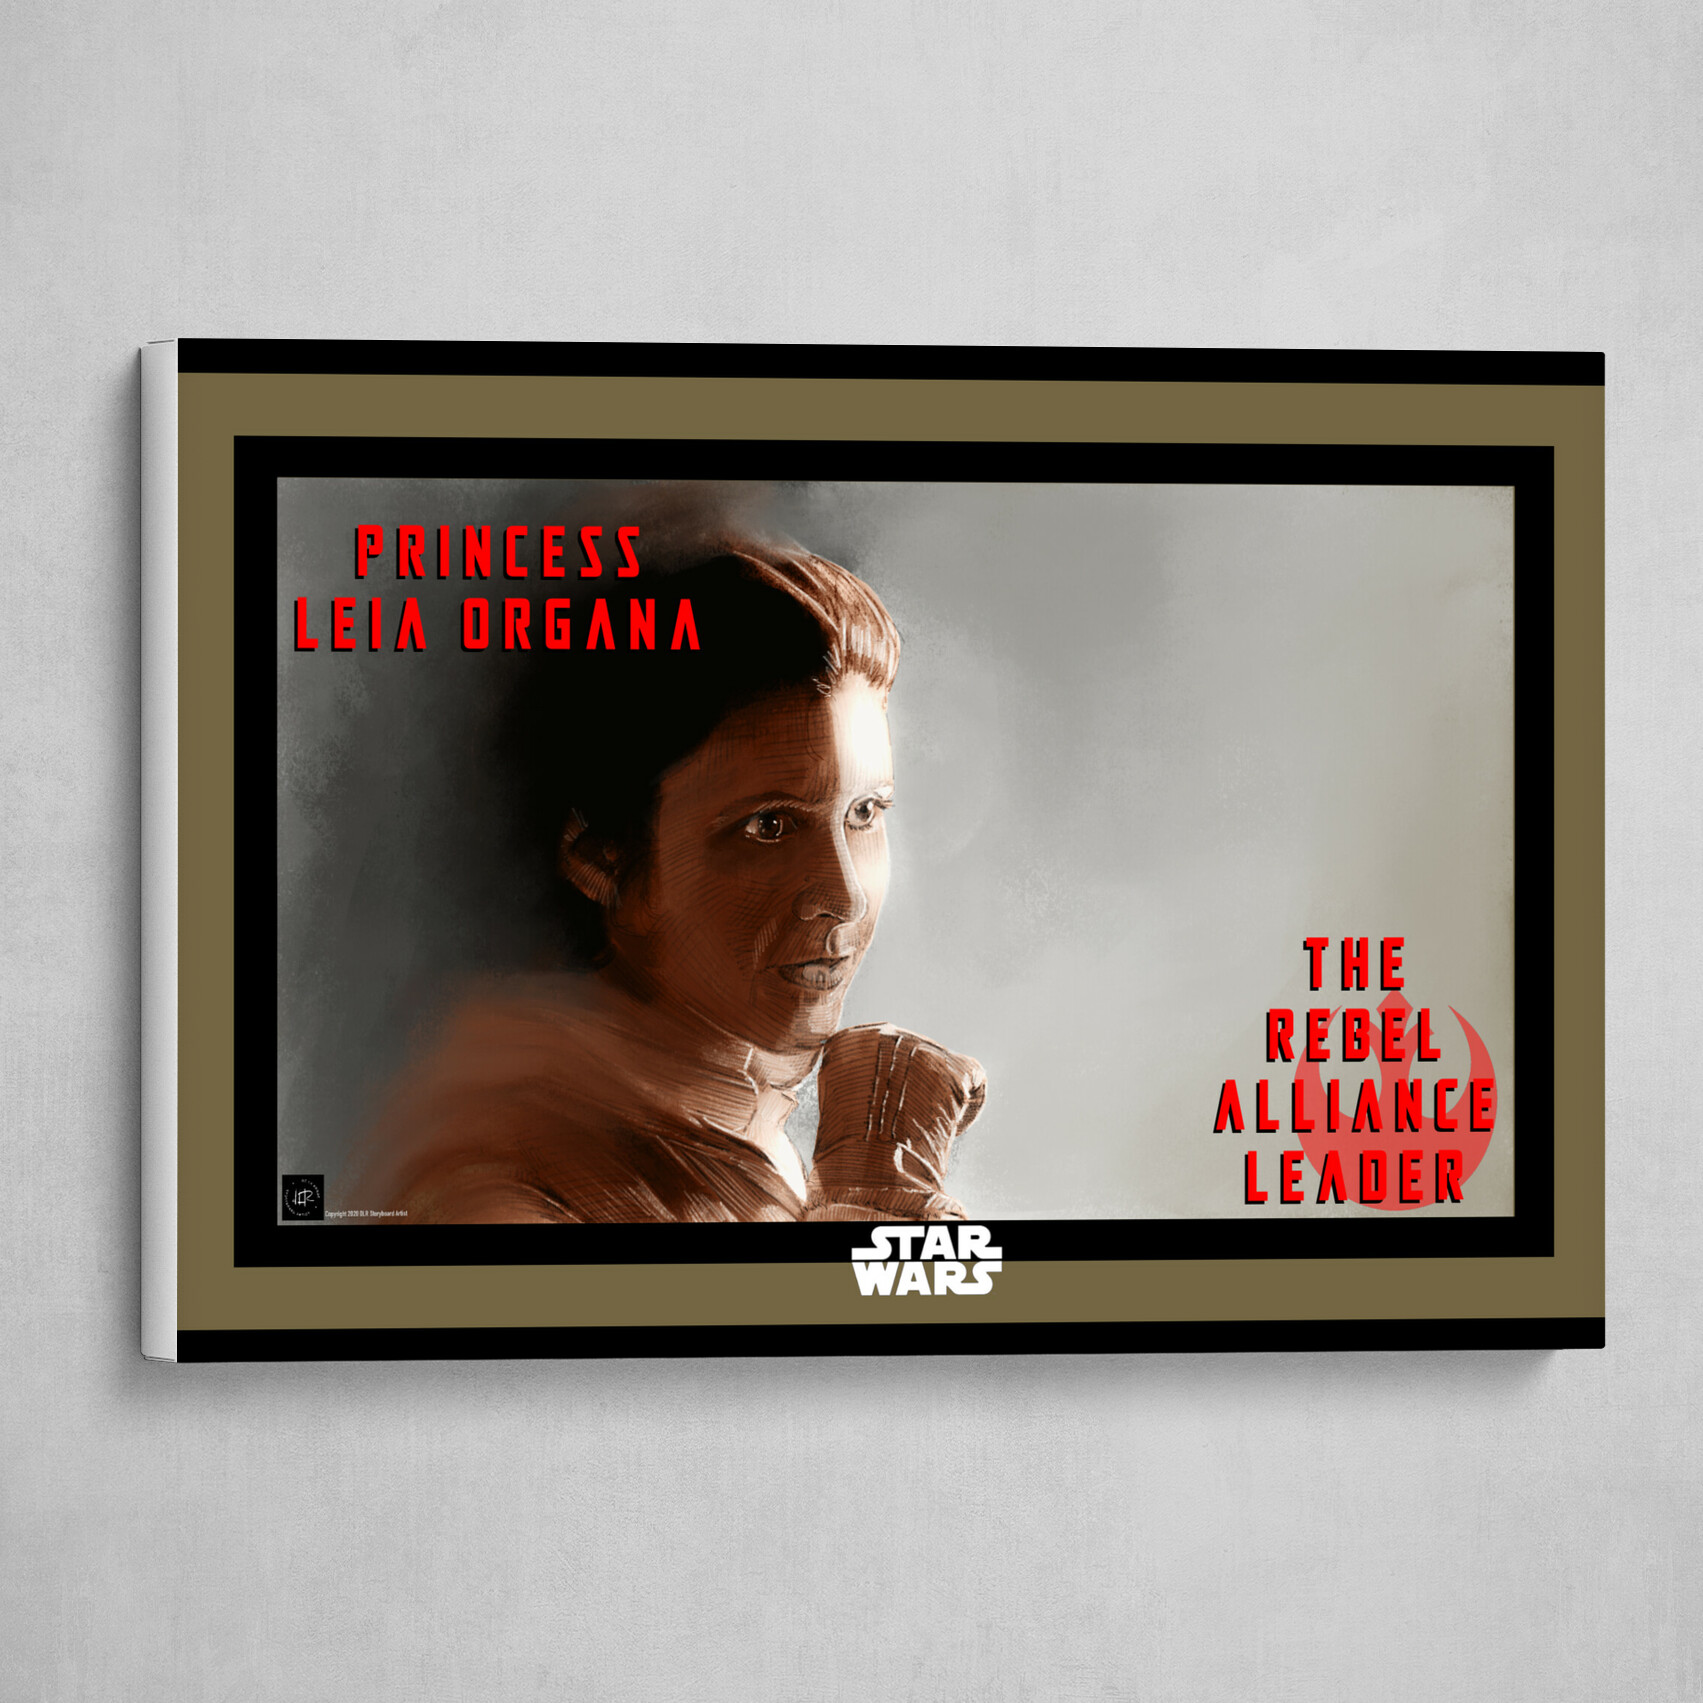 The Rebel Alliance Leader Poster